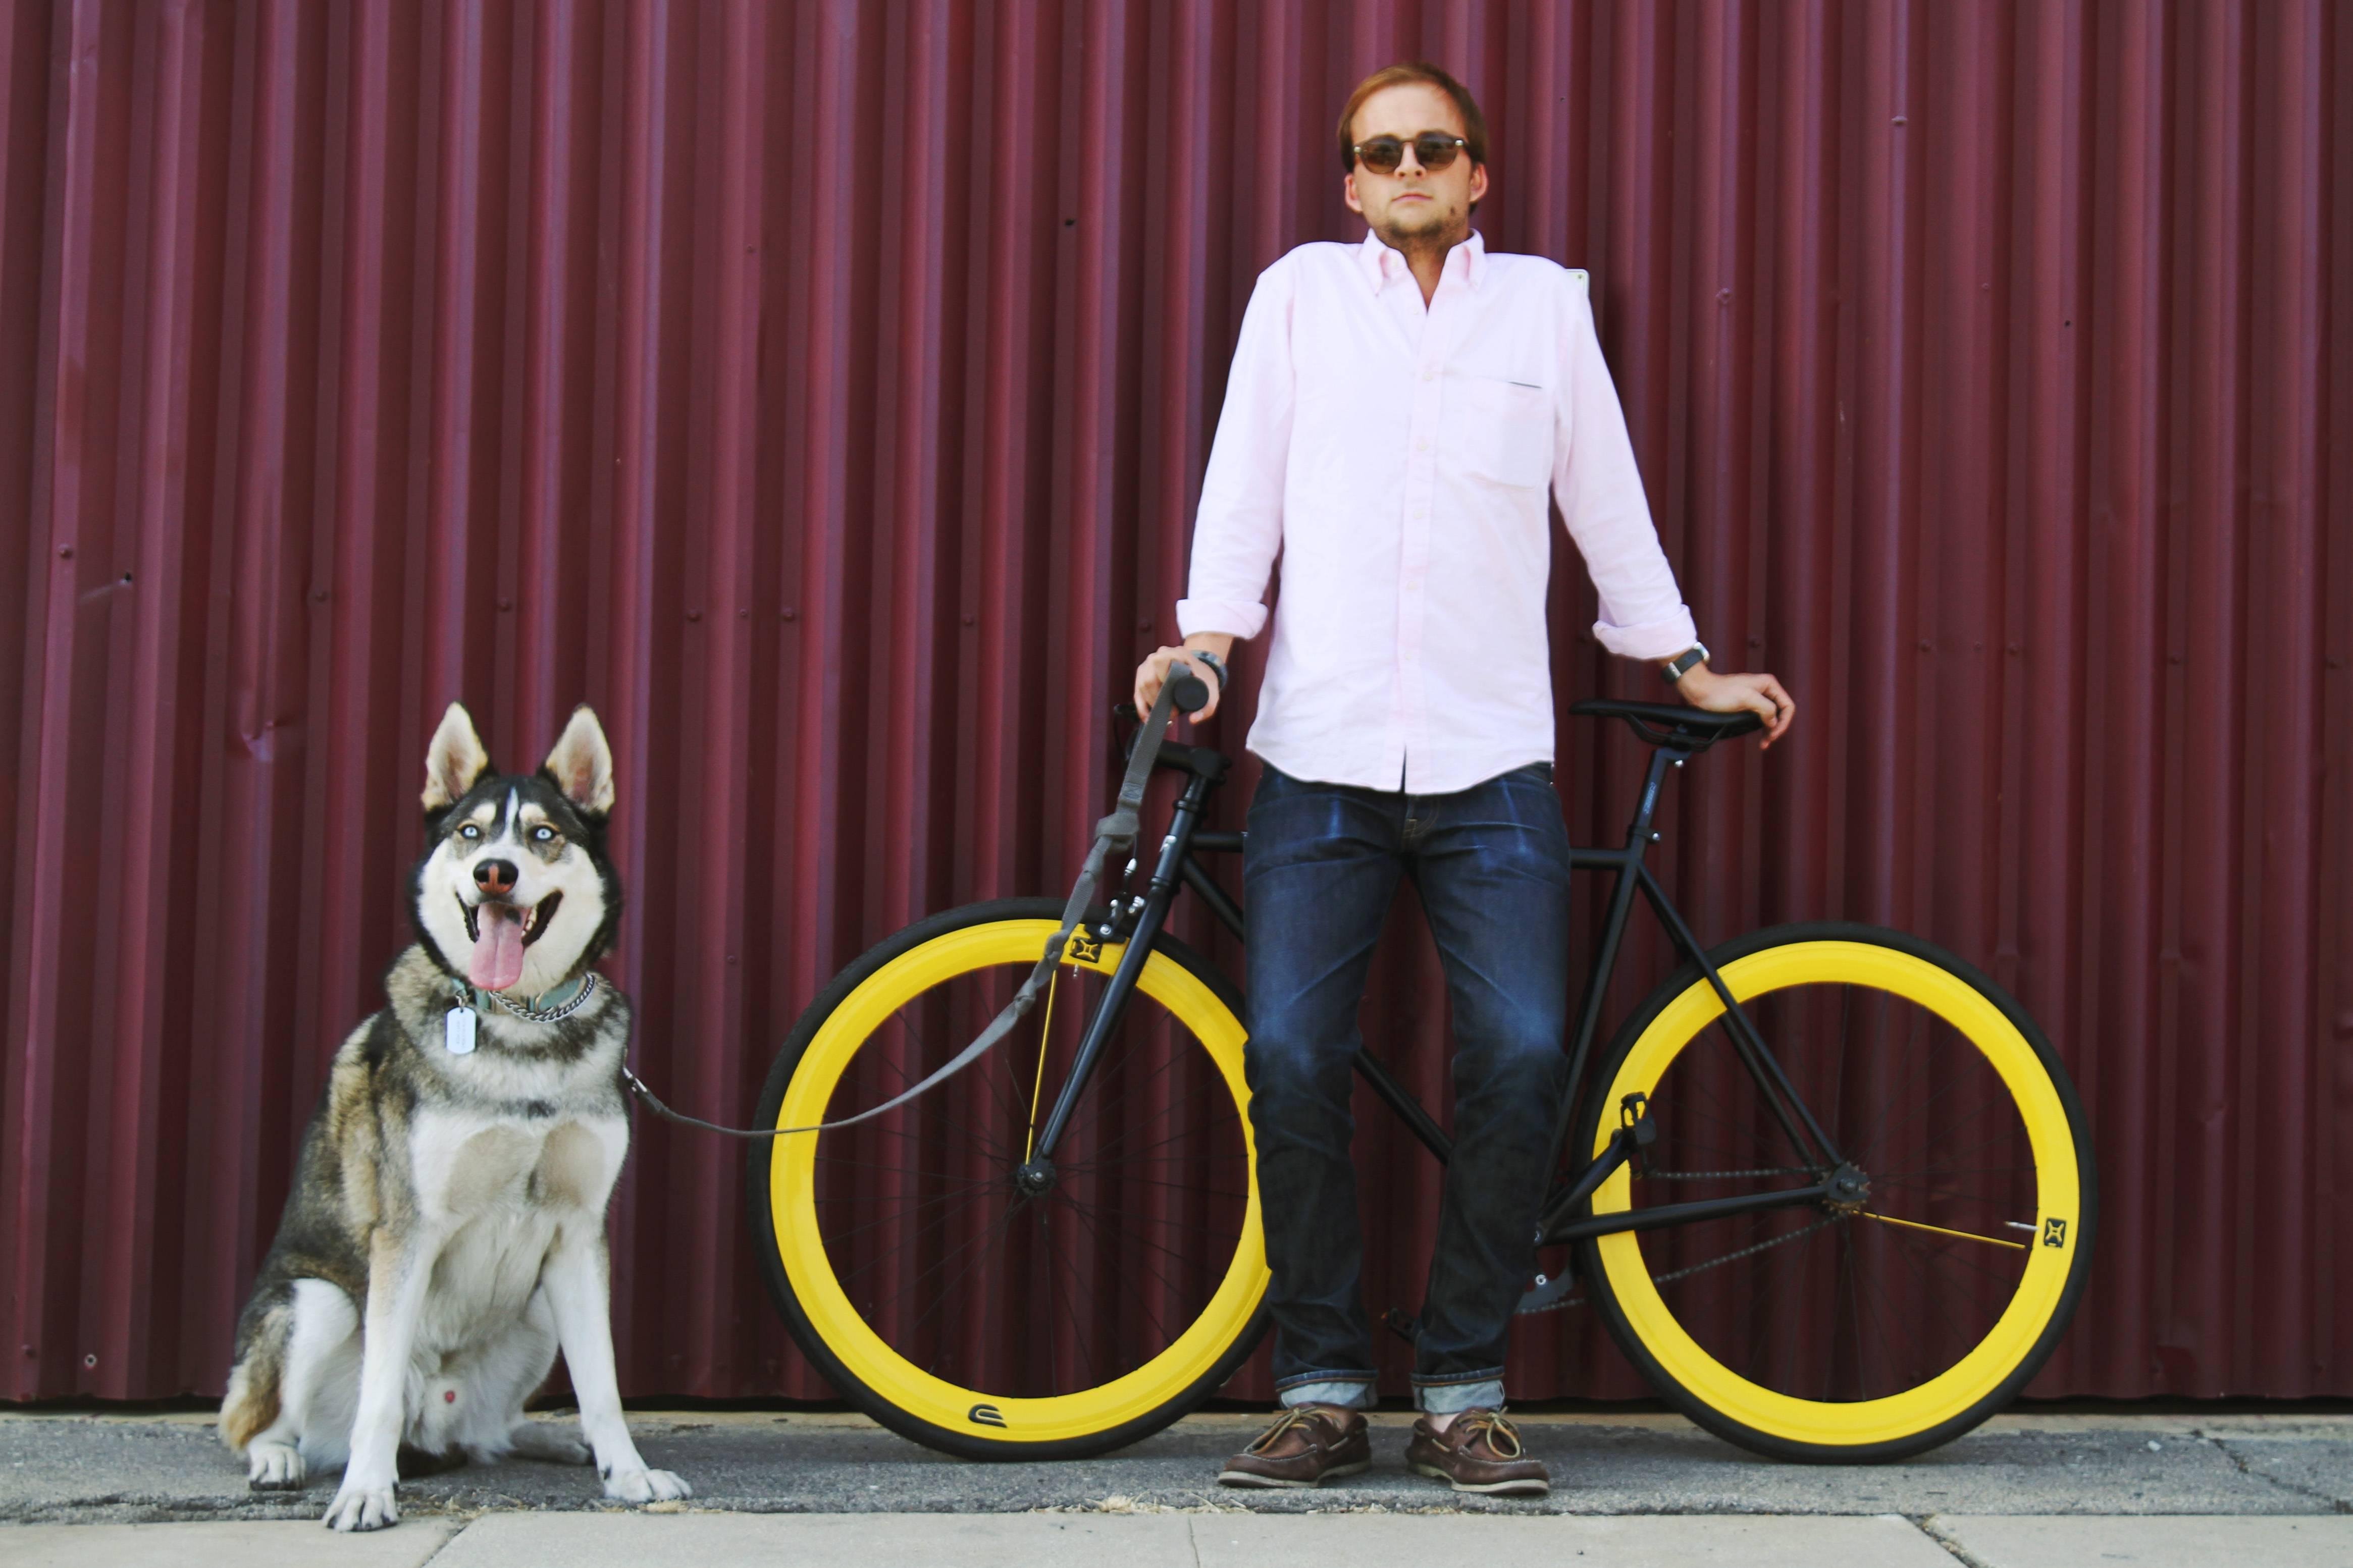 Jordan-Schau-CEO-of-Pure-Fix-Cycles-uses-analytics-tool-SumAll--1.jpg